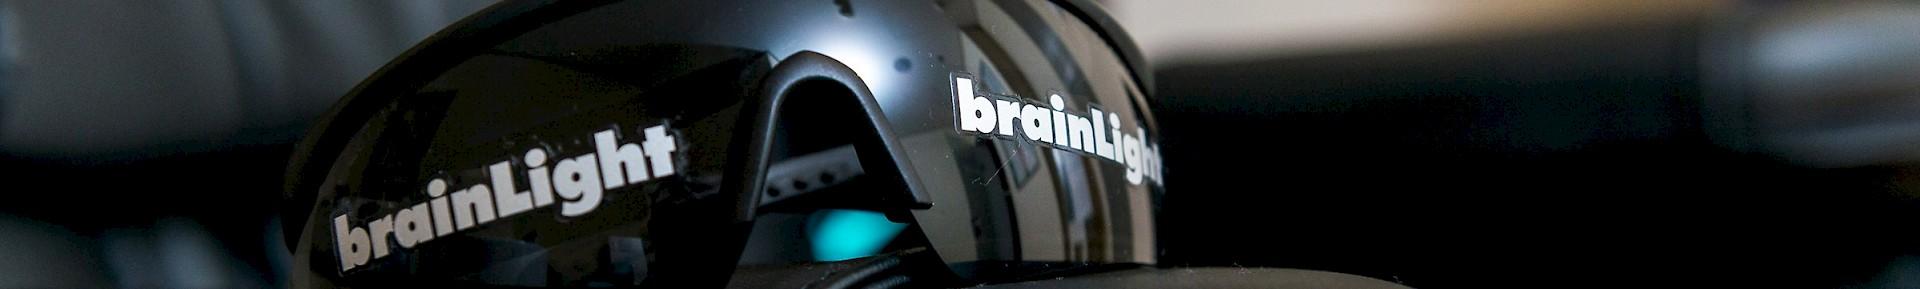 De Brainlight-massagestoel